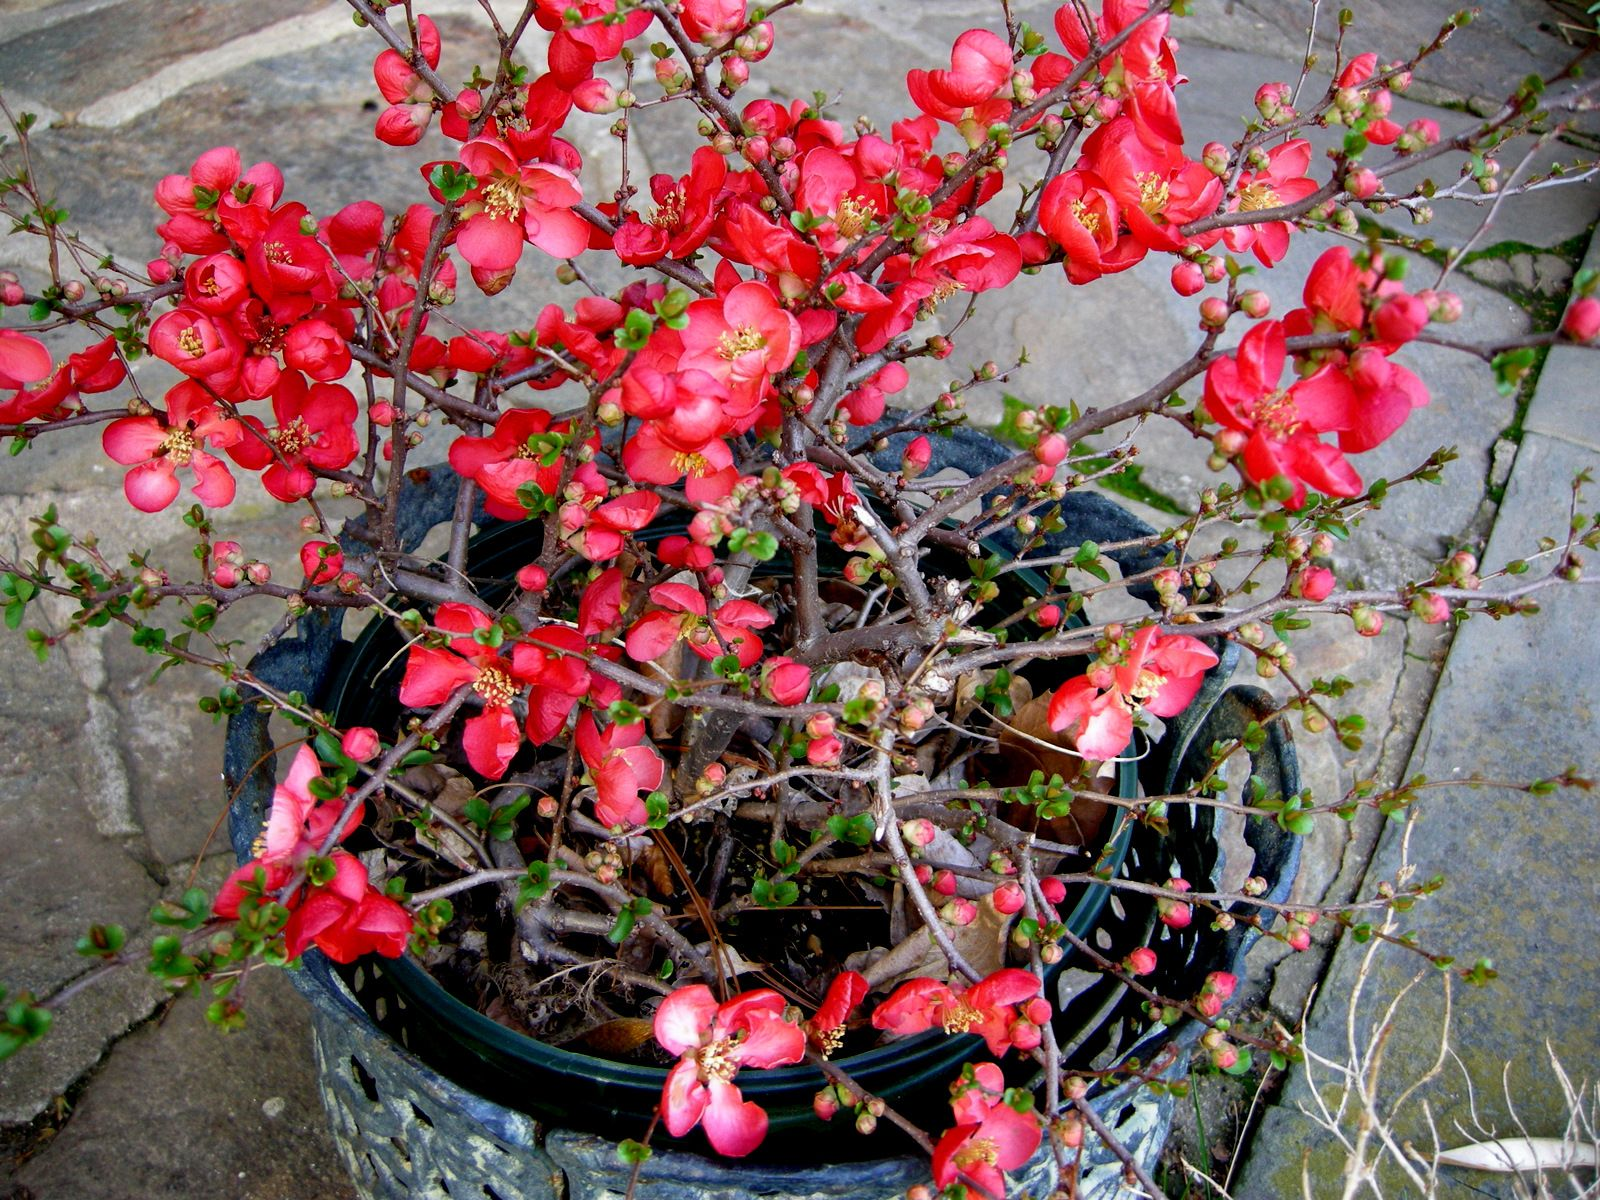 Ảnh cây Bonsai mai đỏ